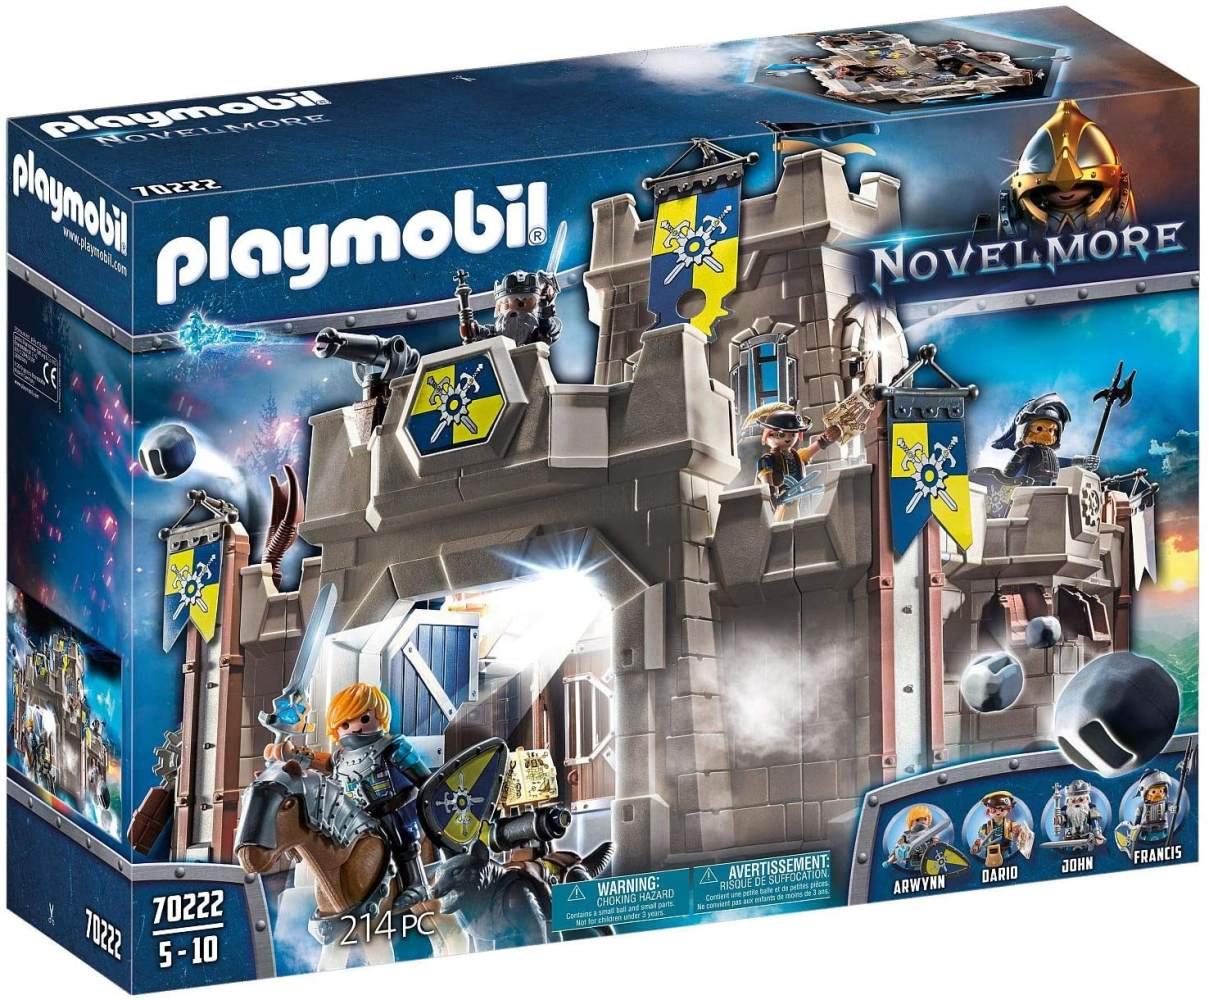 Playmobil Novelmore 70222 Spielturm, Actionfiguren-Spielset, 214 Teile, ab 5 Jahren Bild 1